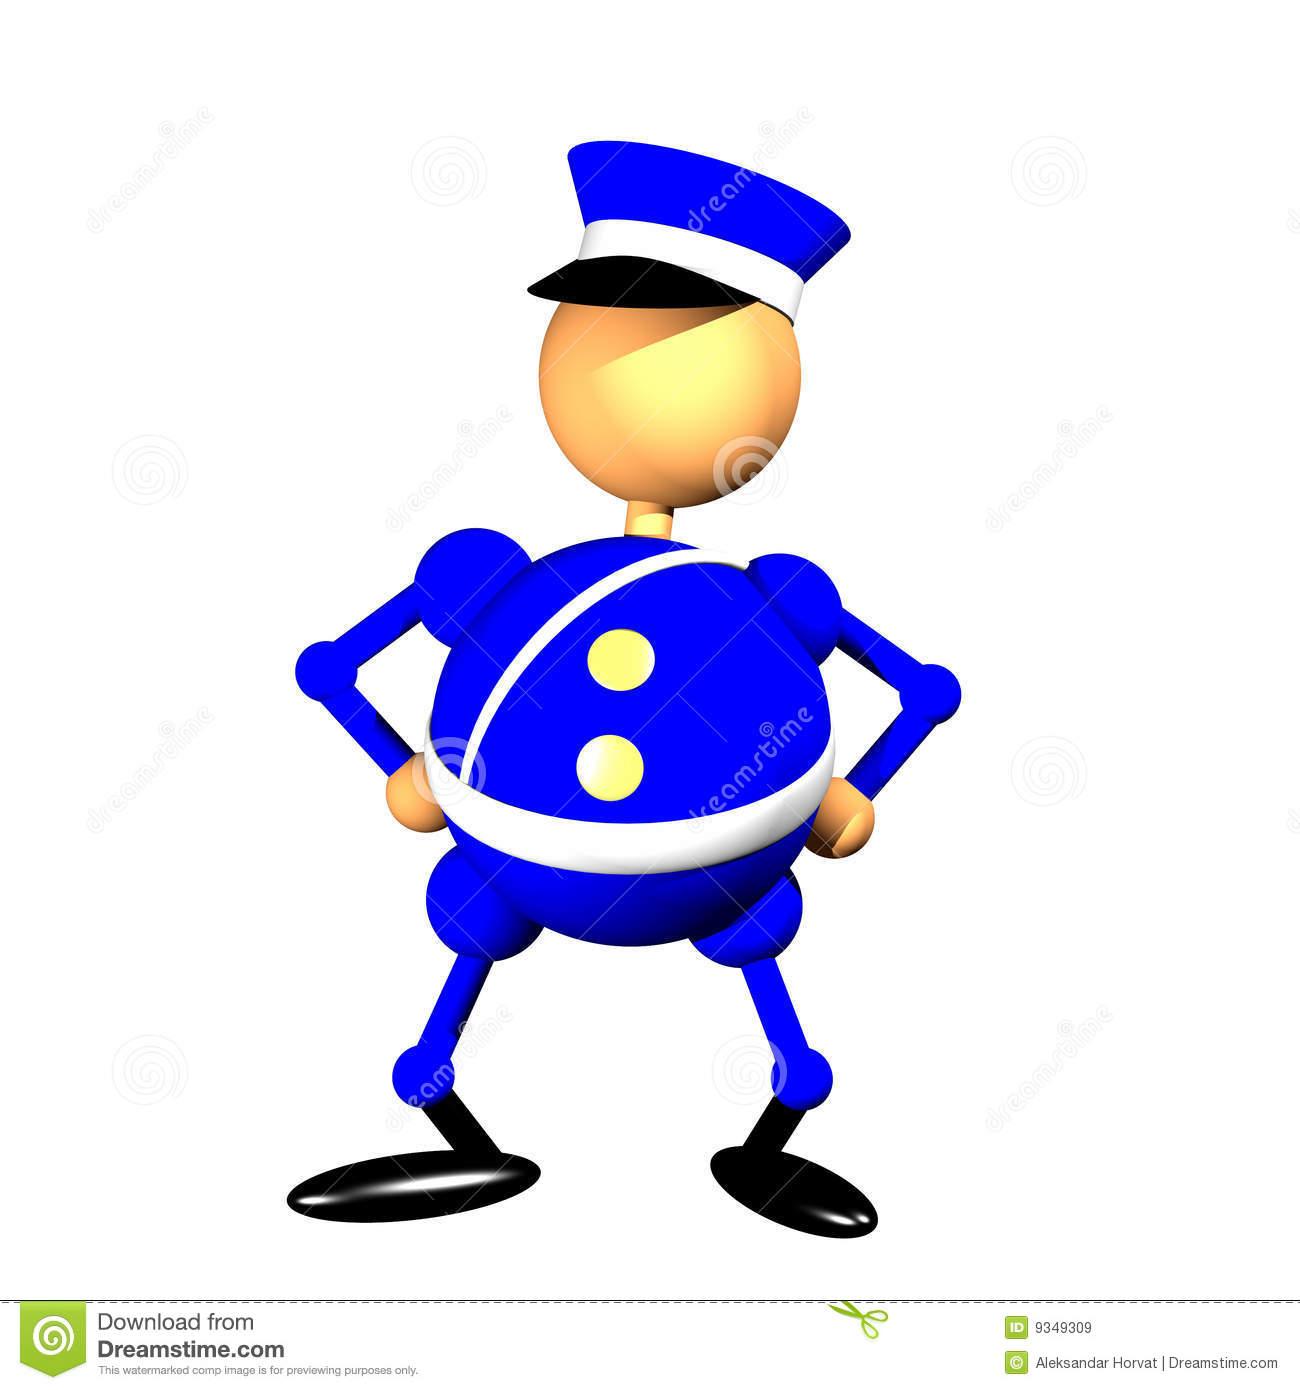 patrol%20clipart